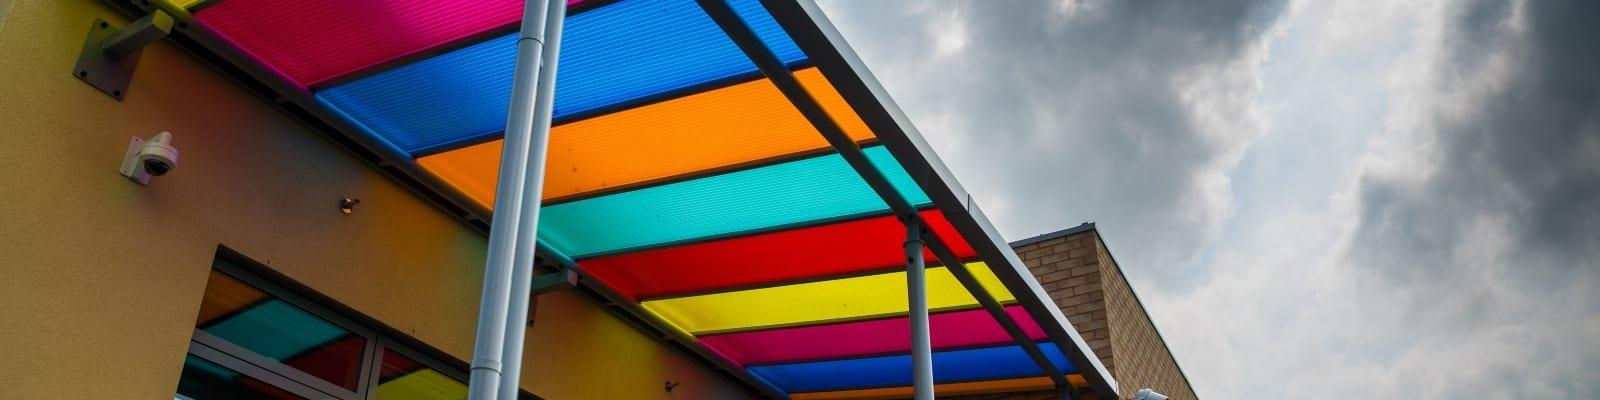 Ysgol Bro Teifi Colourful Canopy